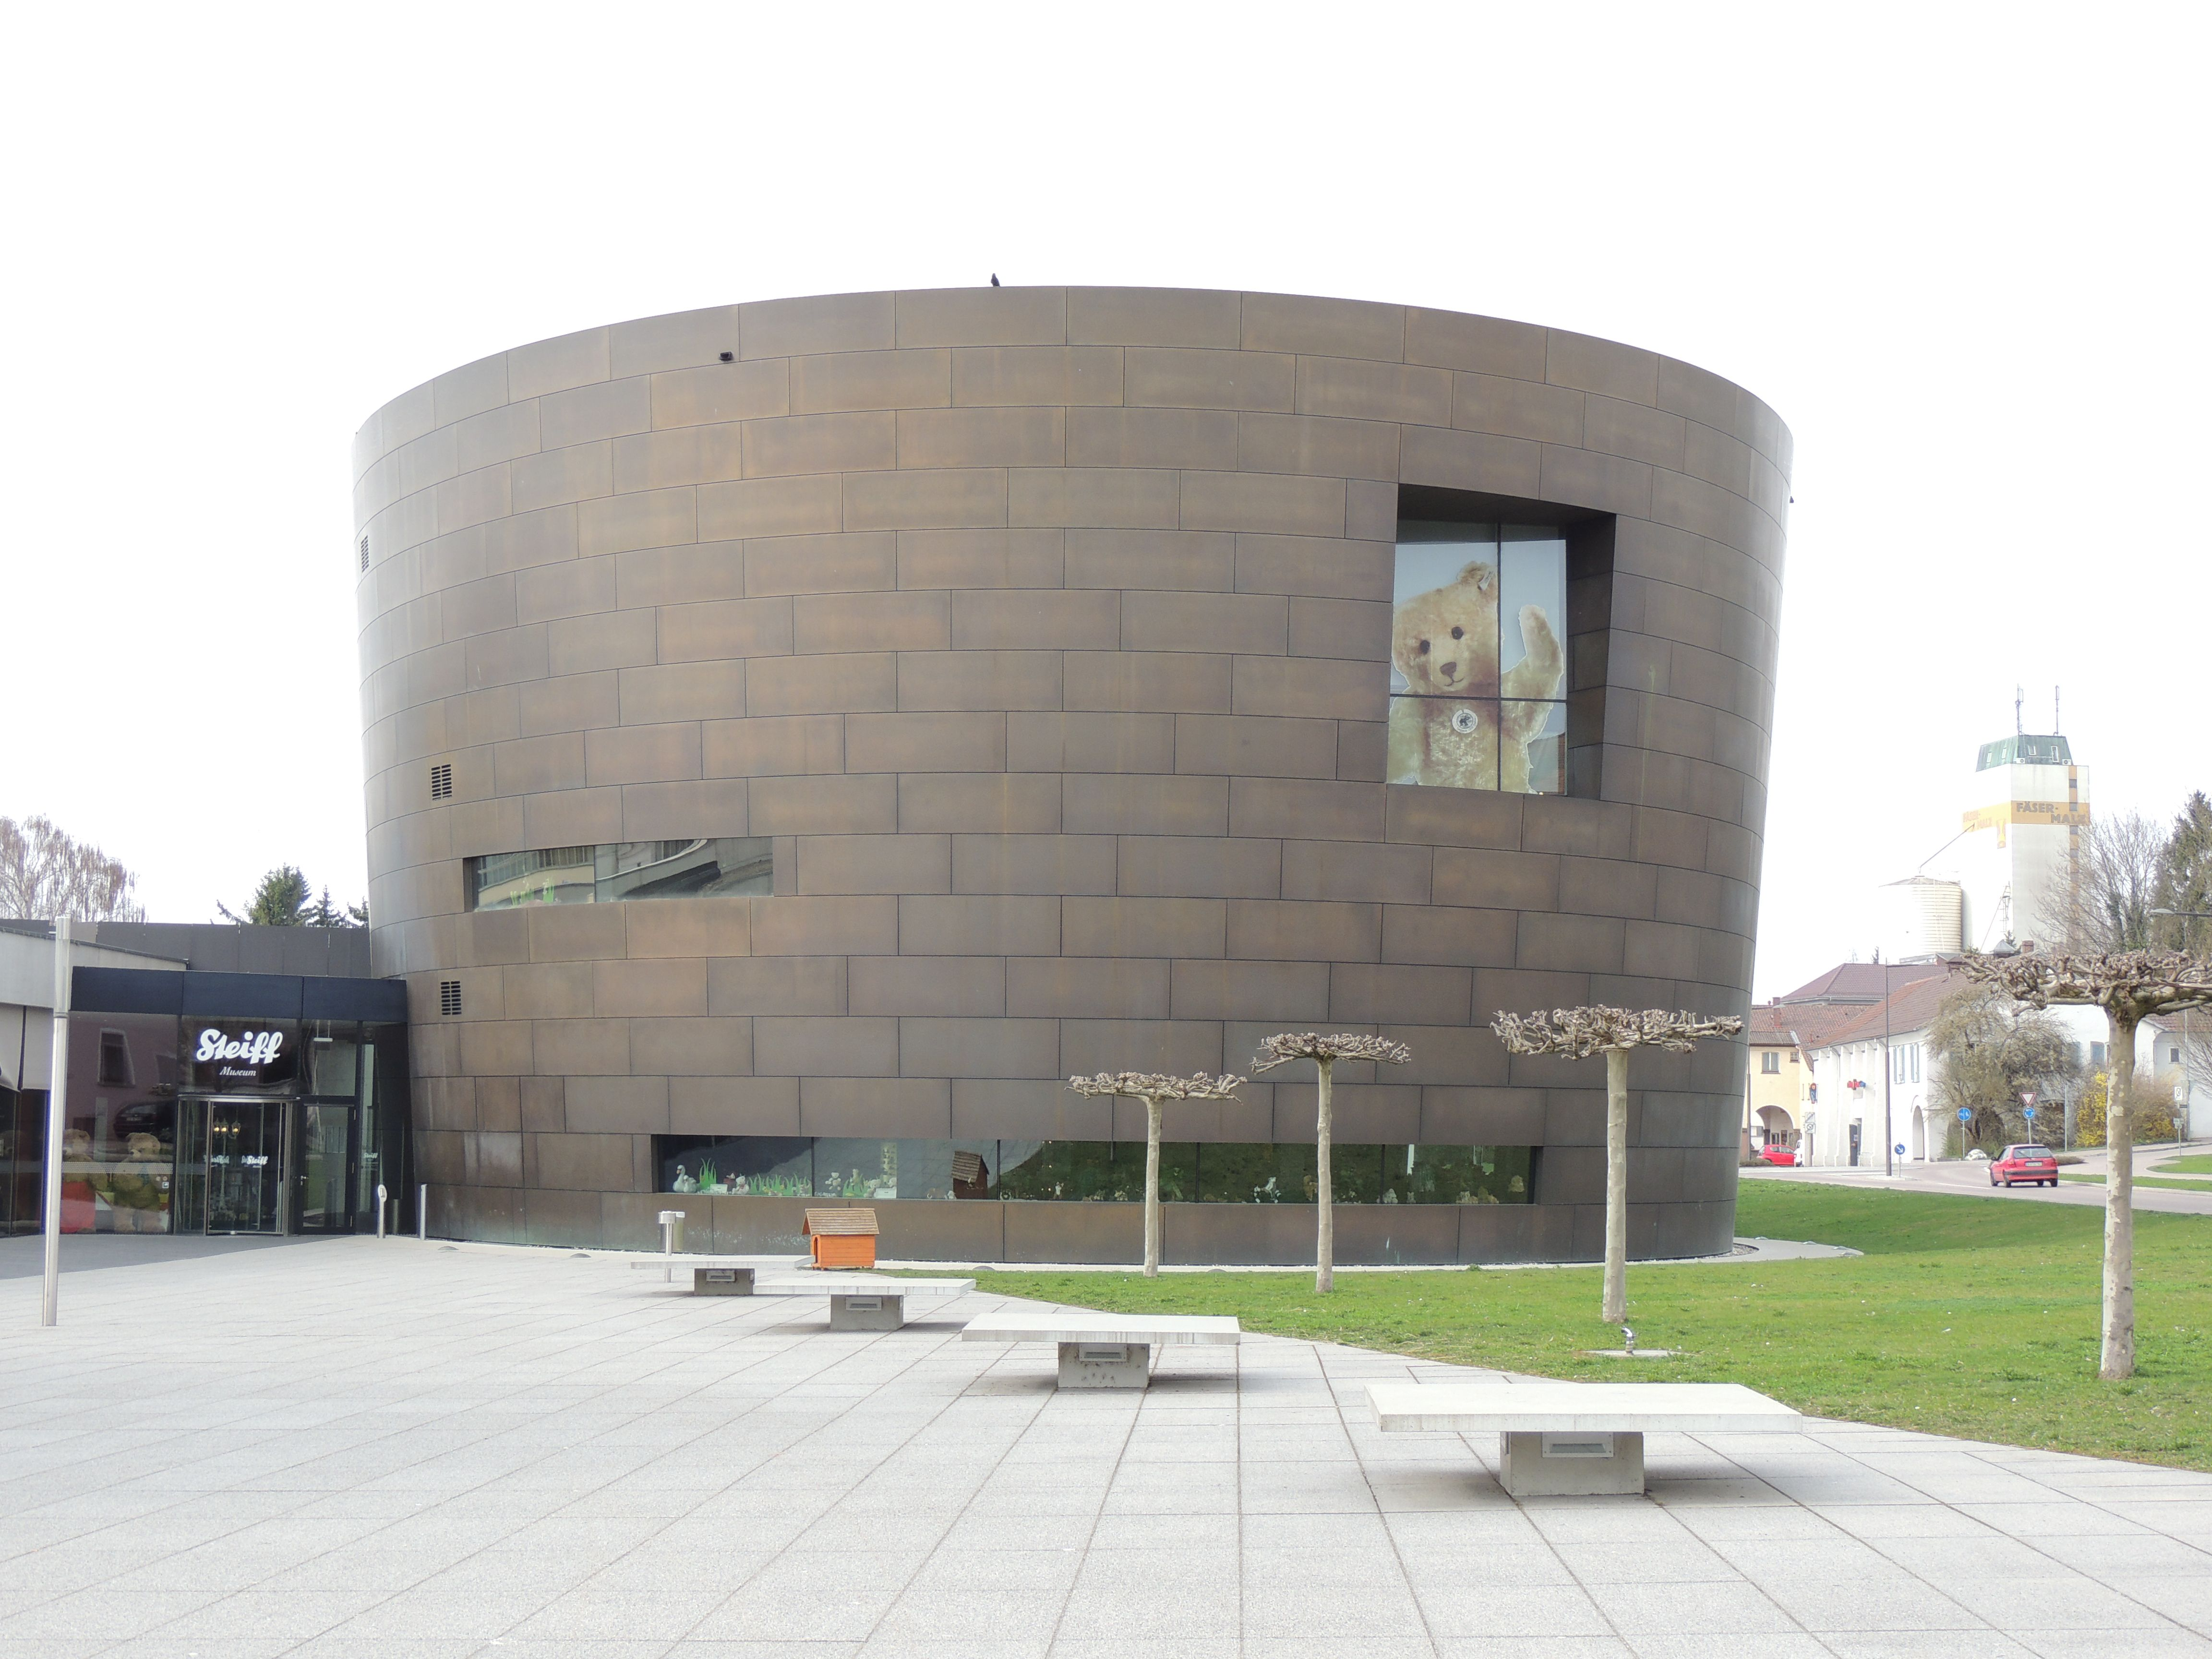 The Steiff Museum In Giengen An Der Brenz Germany Birthplace Of The Teddy Bear Steiff Patio Outdoor Decor